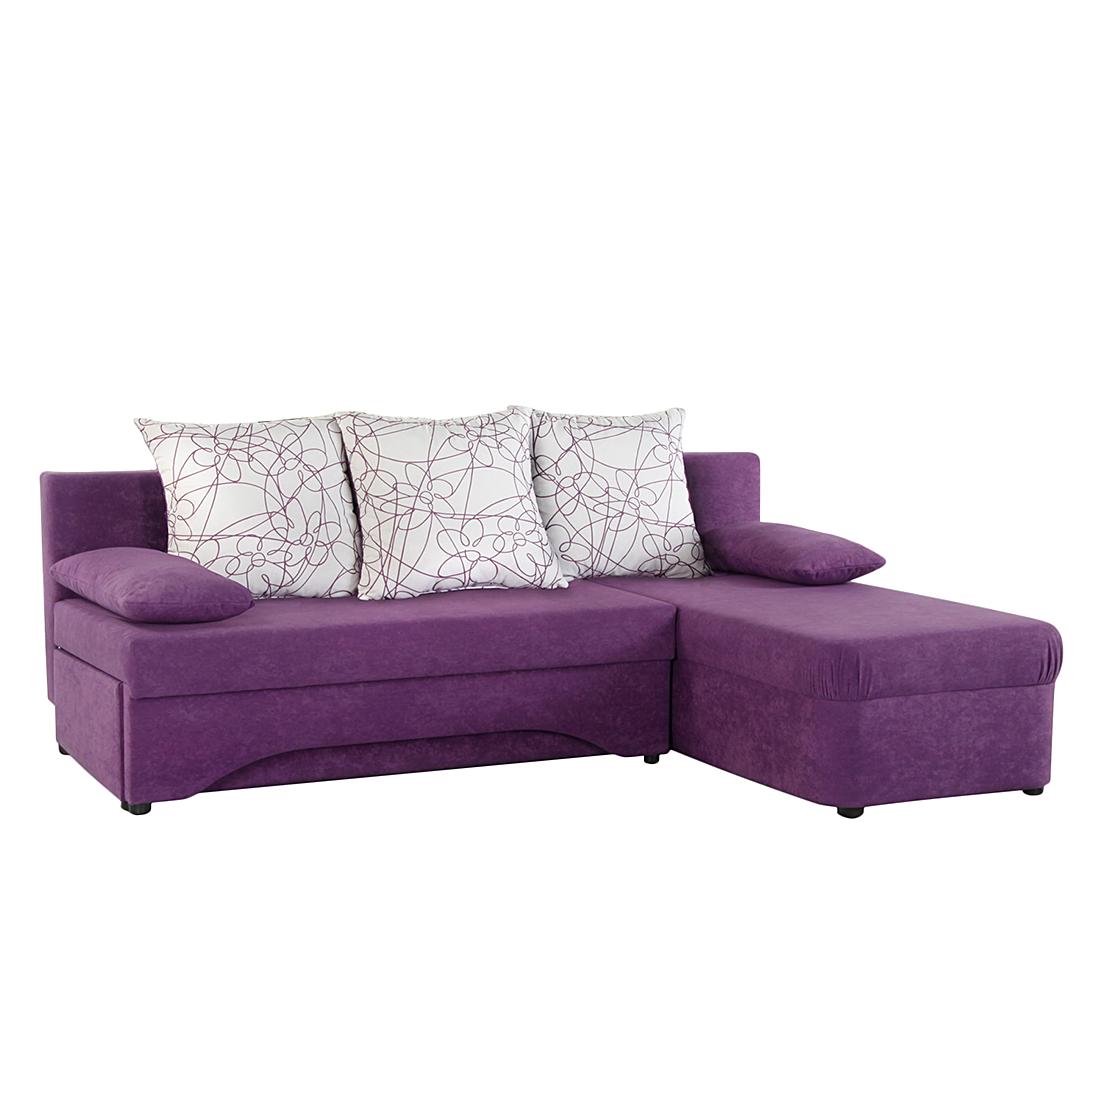 lila schlafsofa m belideen. Black Bedroom Furniture Sets. Home Design Ideas